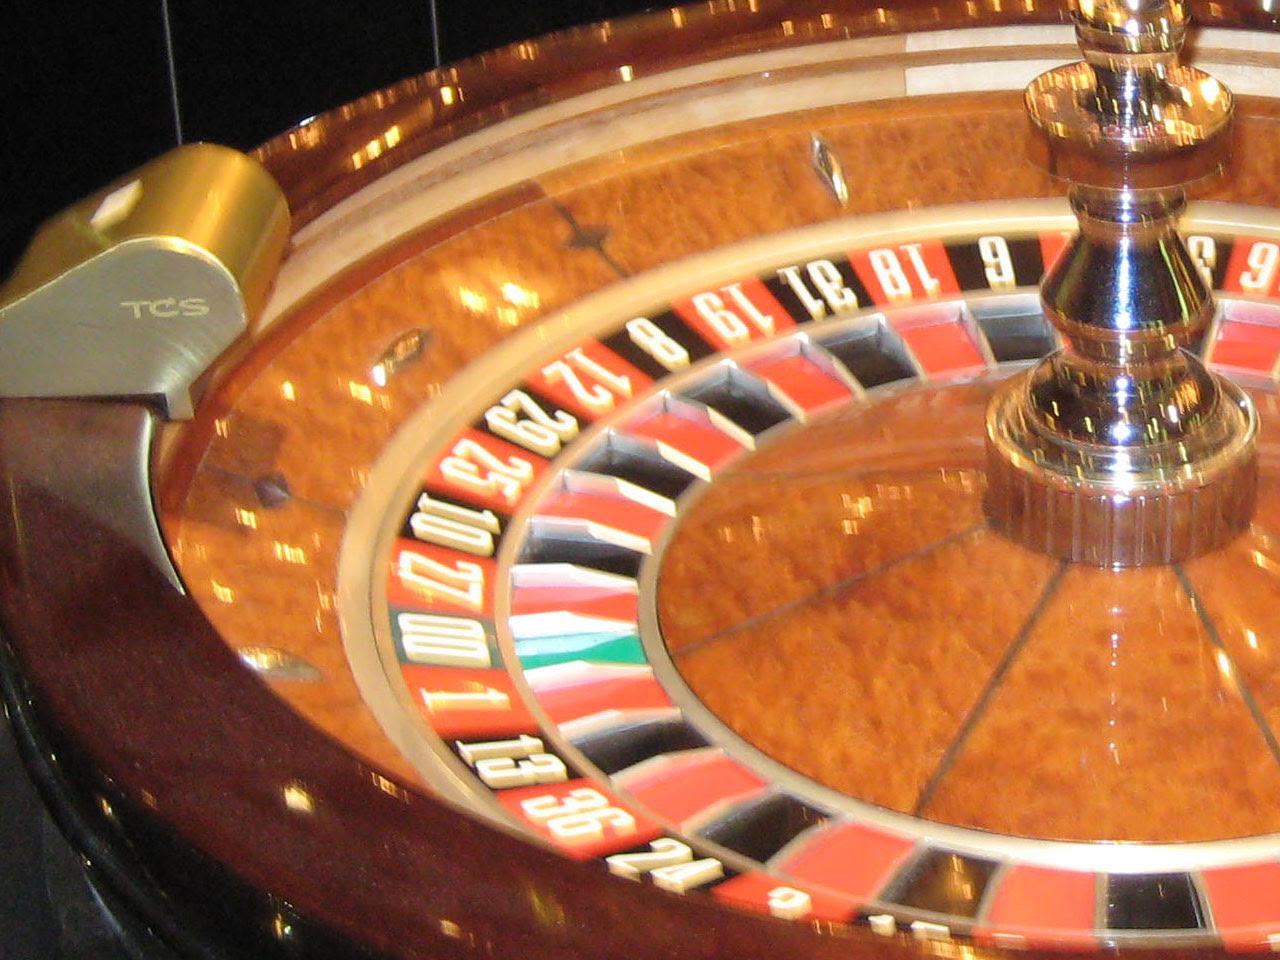 Spin madness no deposit bonus